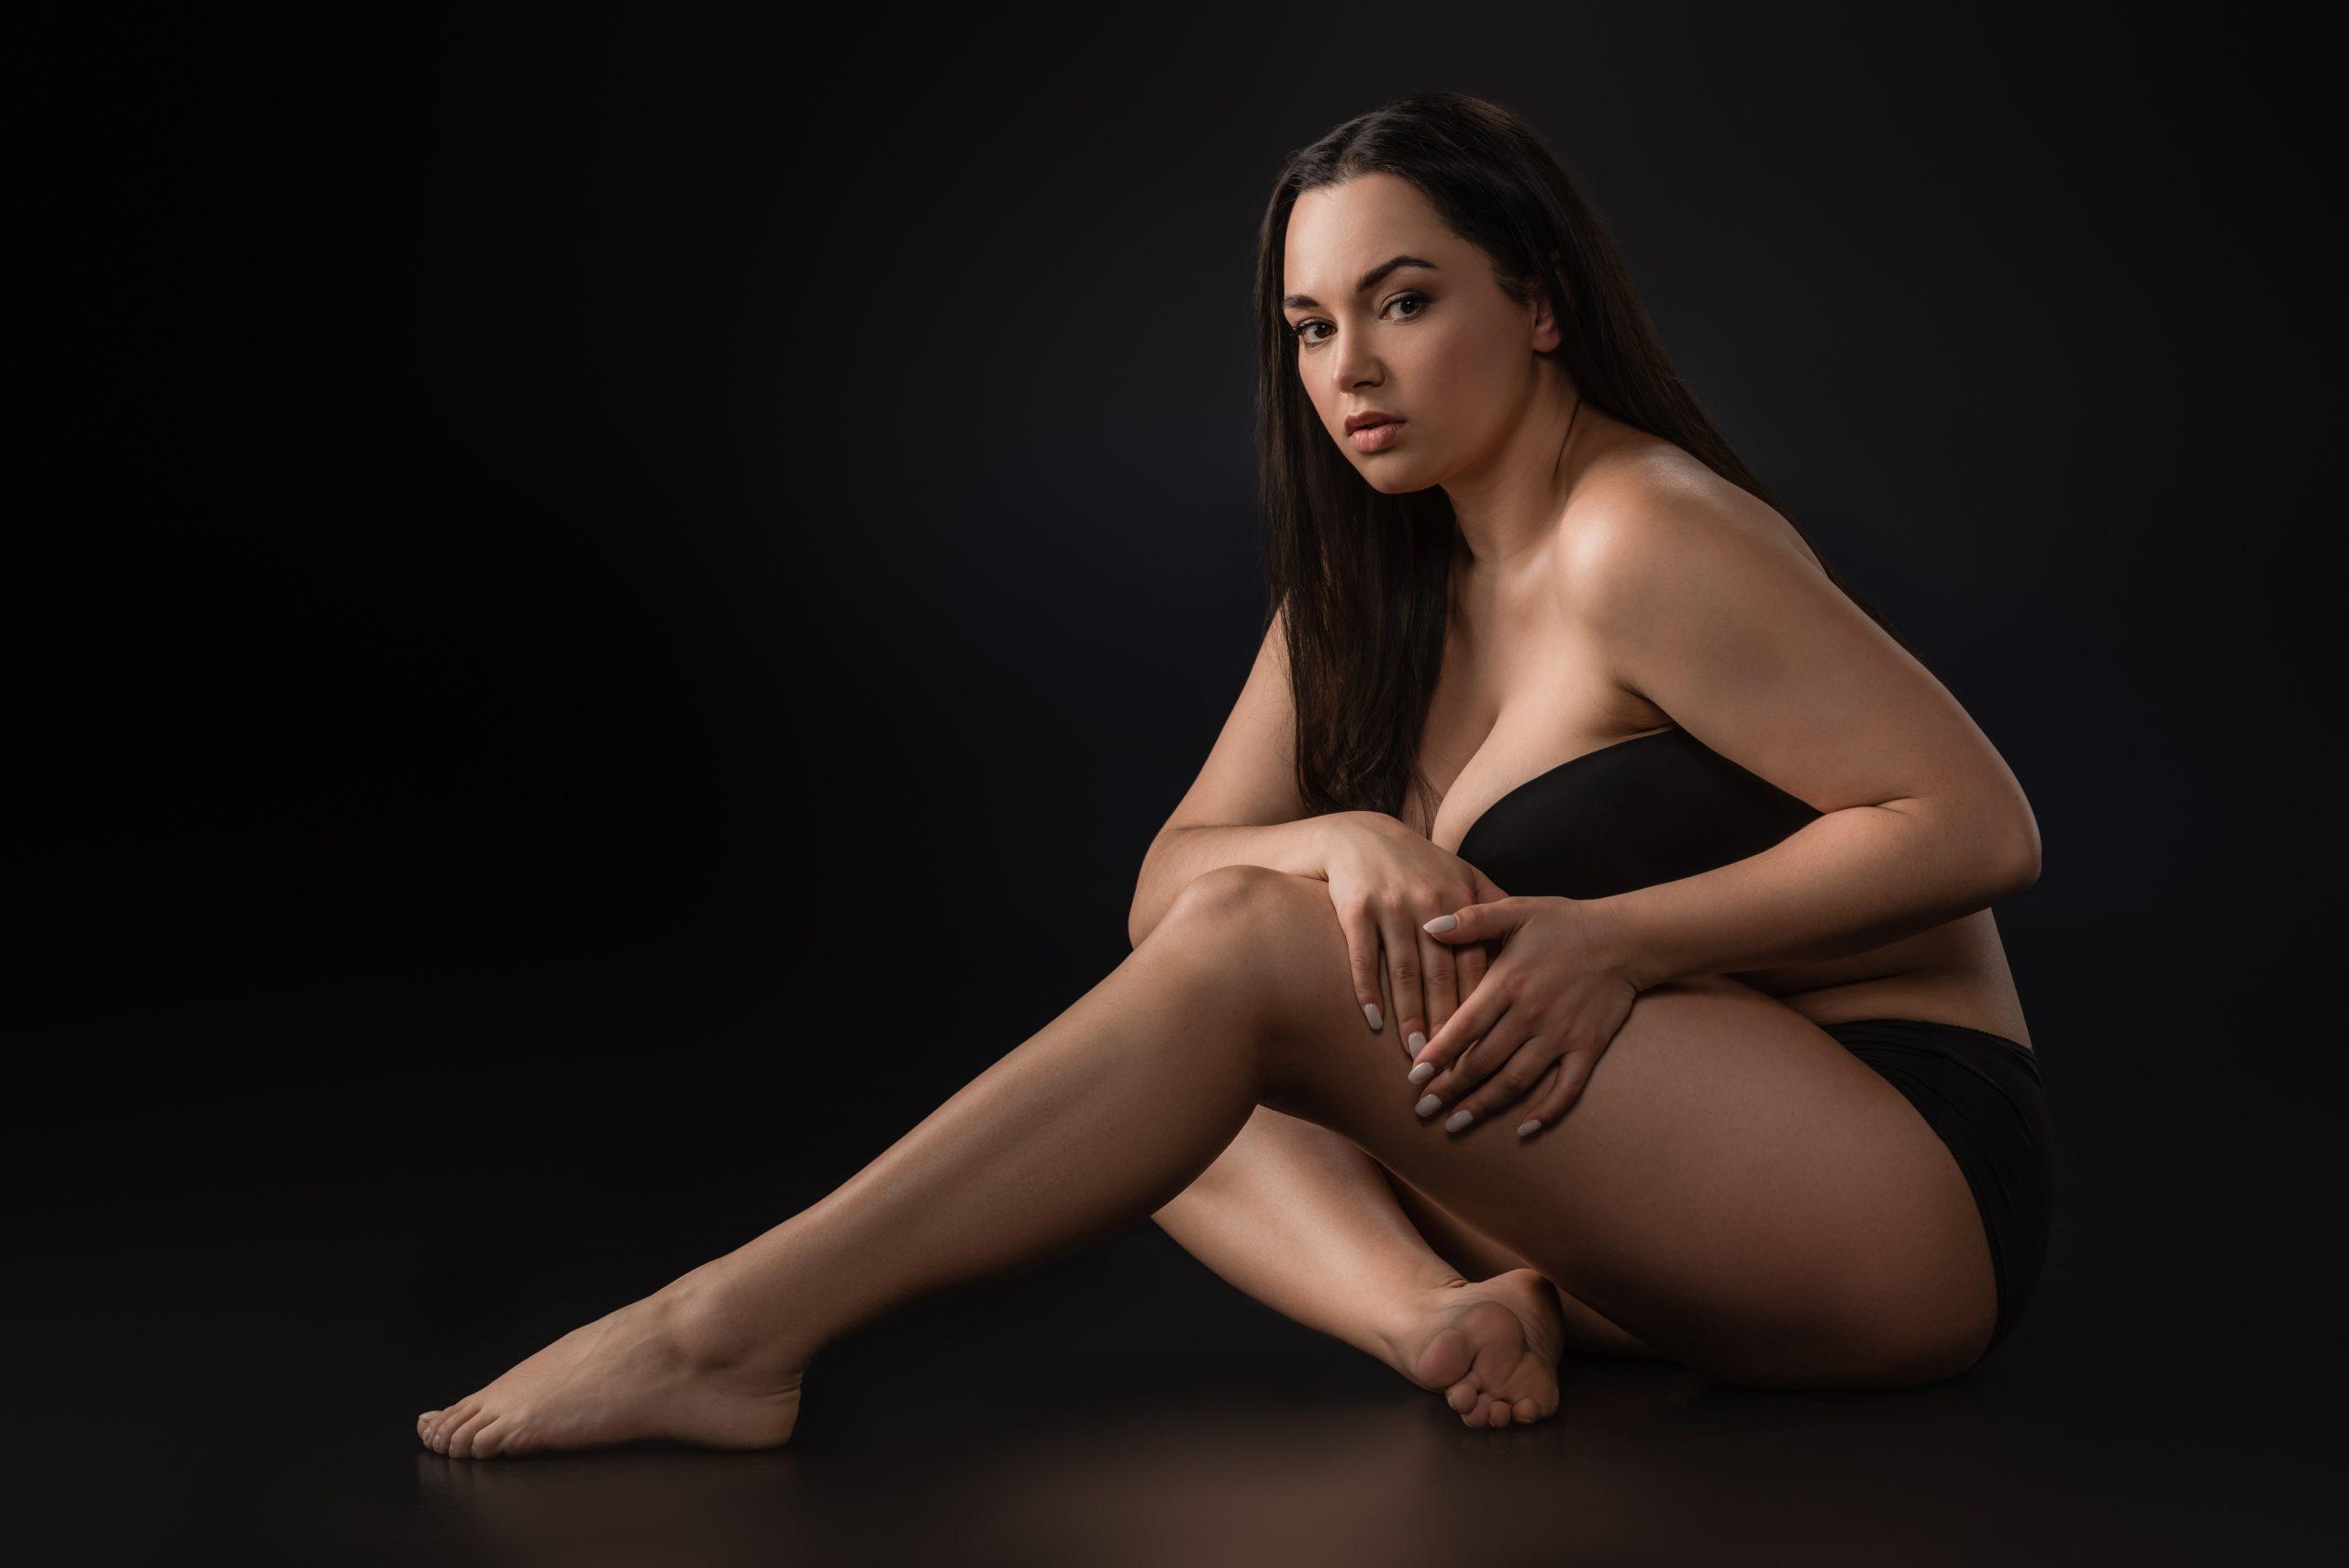 belle-femme-en-culotte-menstruelle-noire-anna-panty